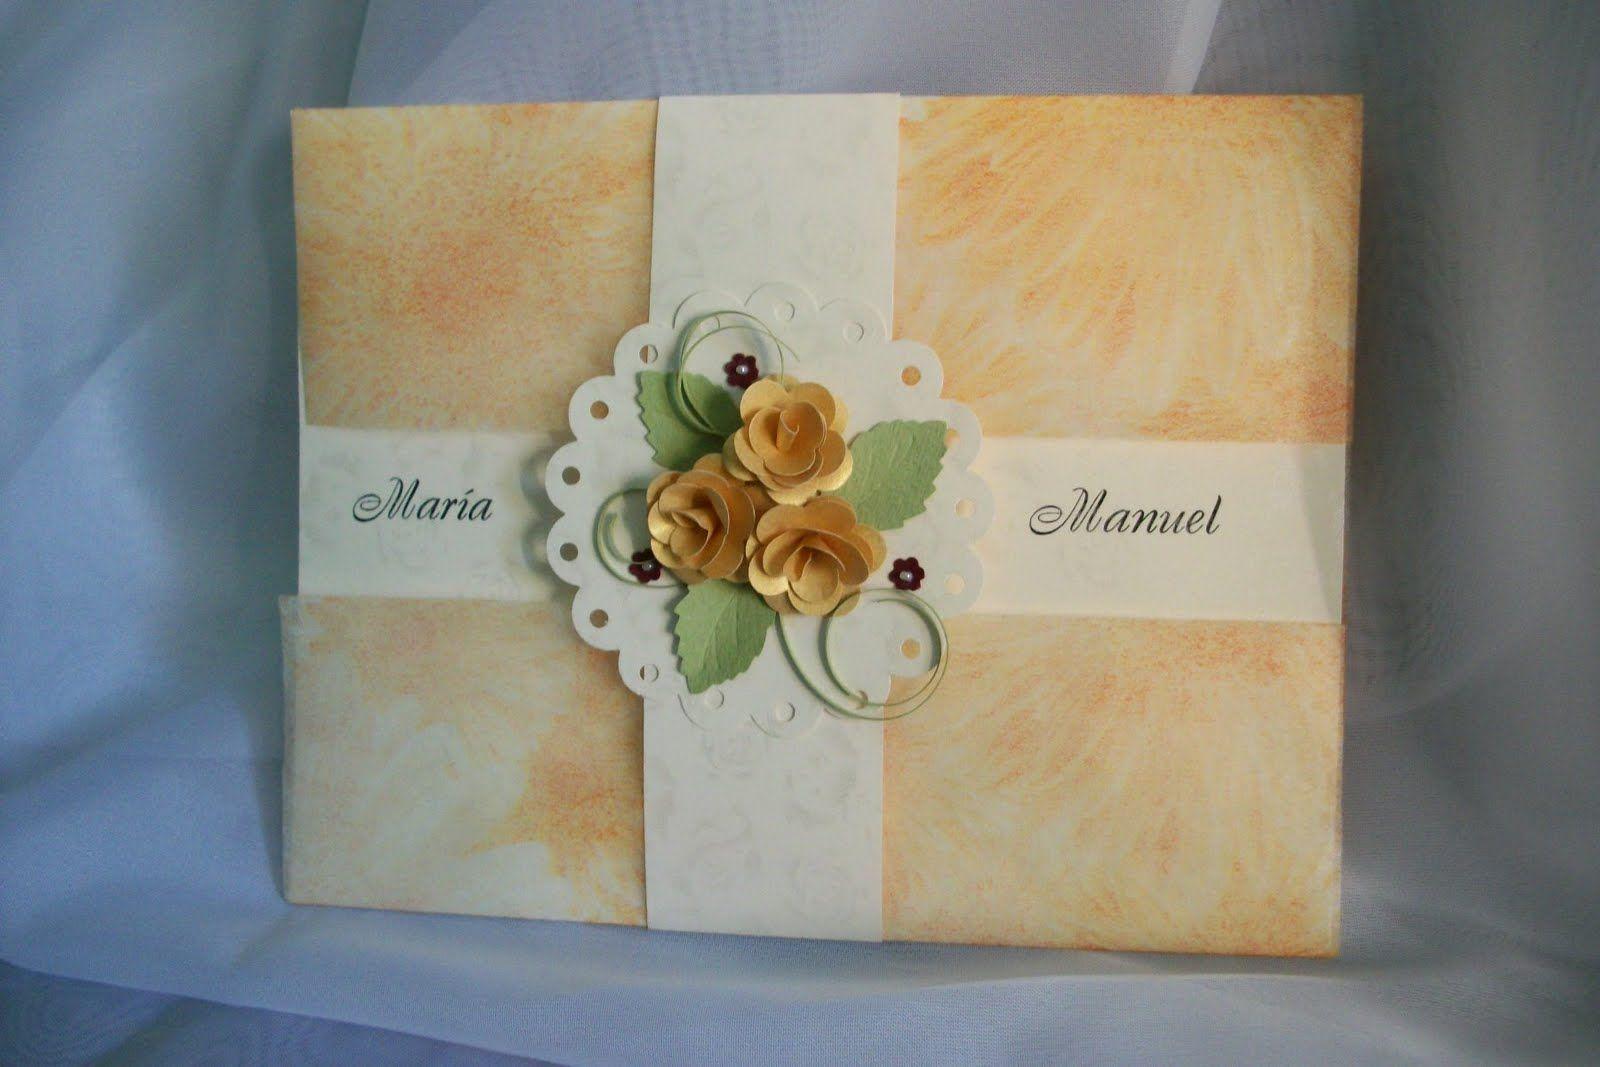 excelentes aprende fcil como hacer cajas para souvenirs de bodas cajas pinterest souvenirs de boda cajas y boda